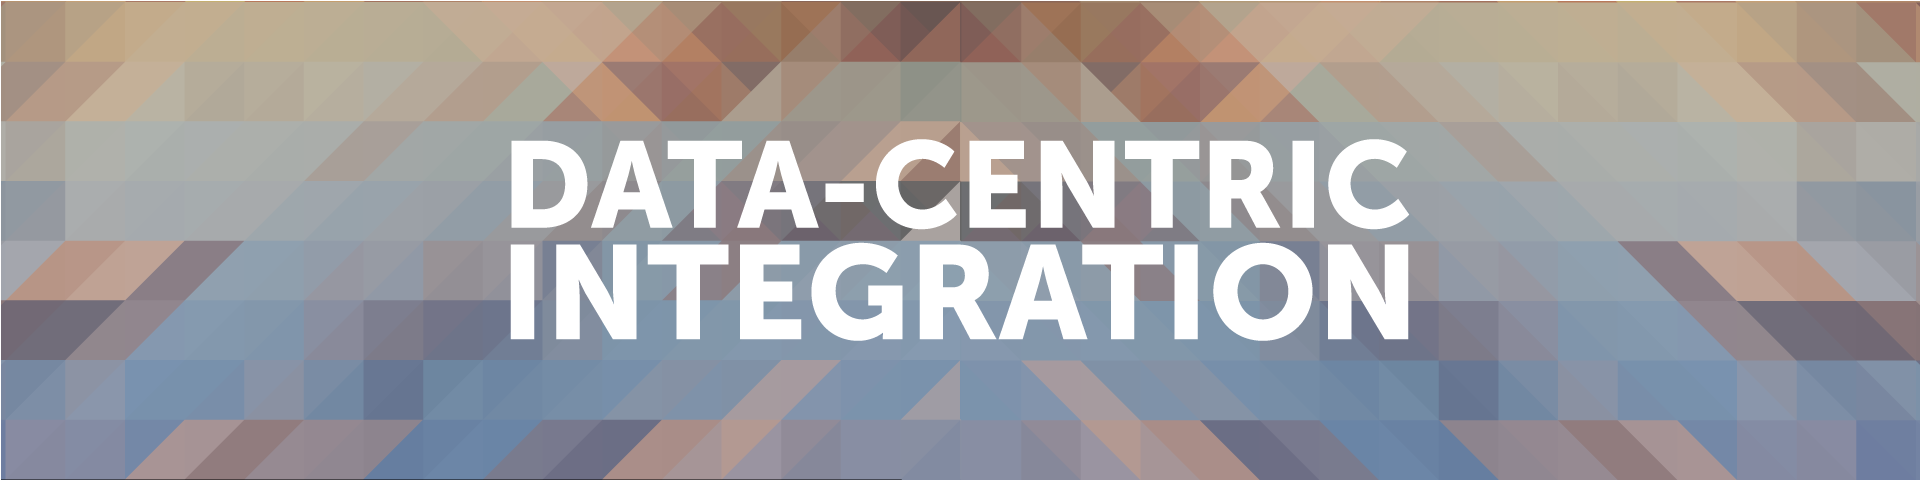 data-centric-integration-blog-banner1.png